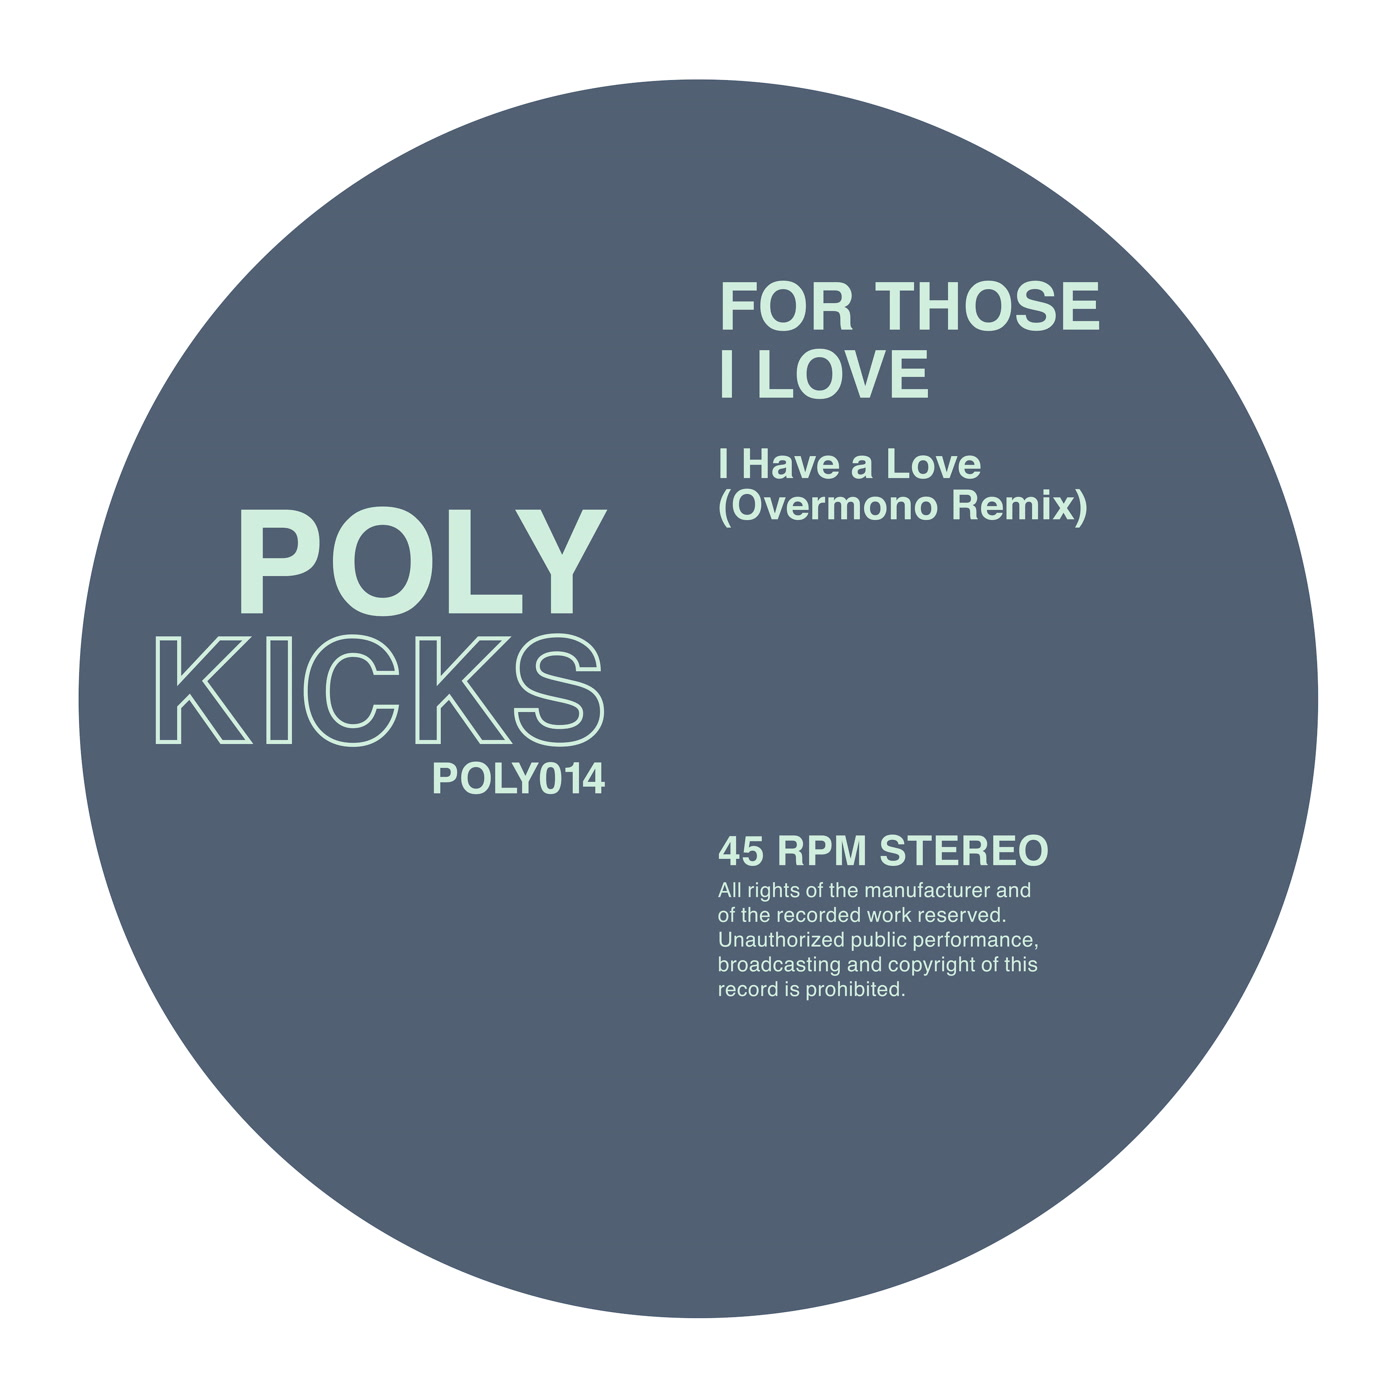 For Those I Love – I Have a Love (Overmono Remix) (Poly Kicks)